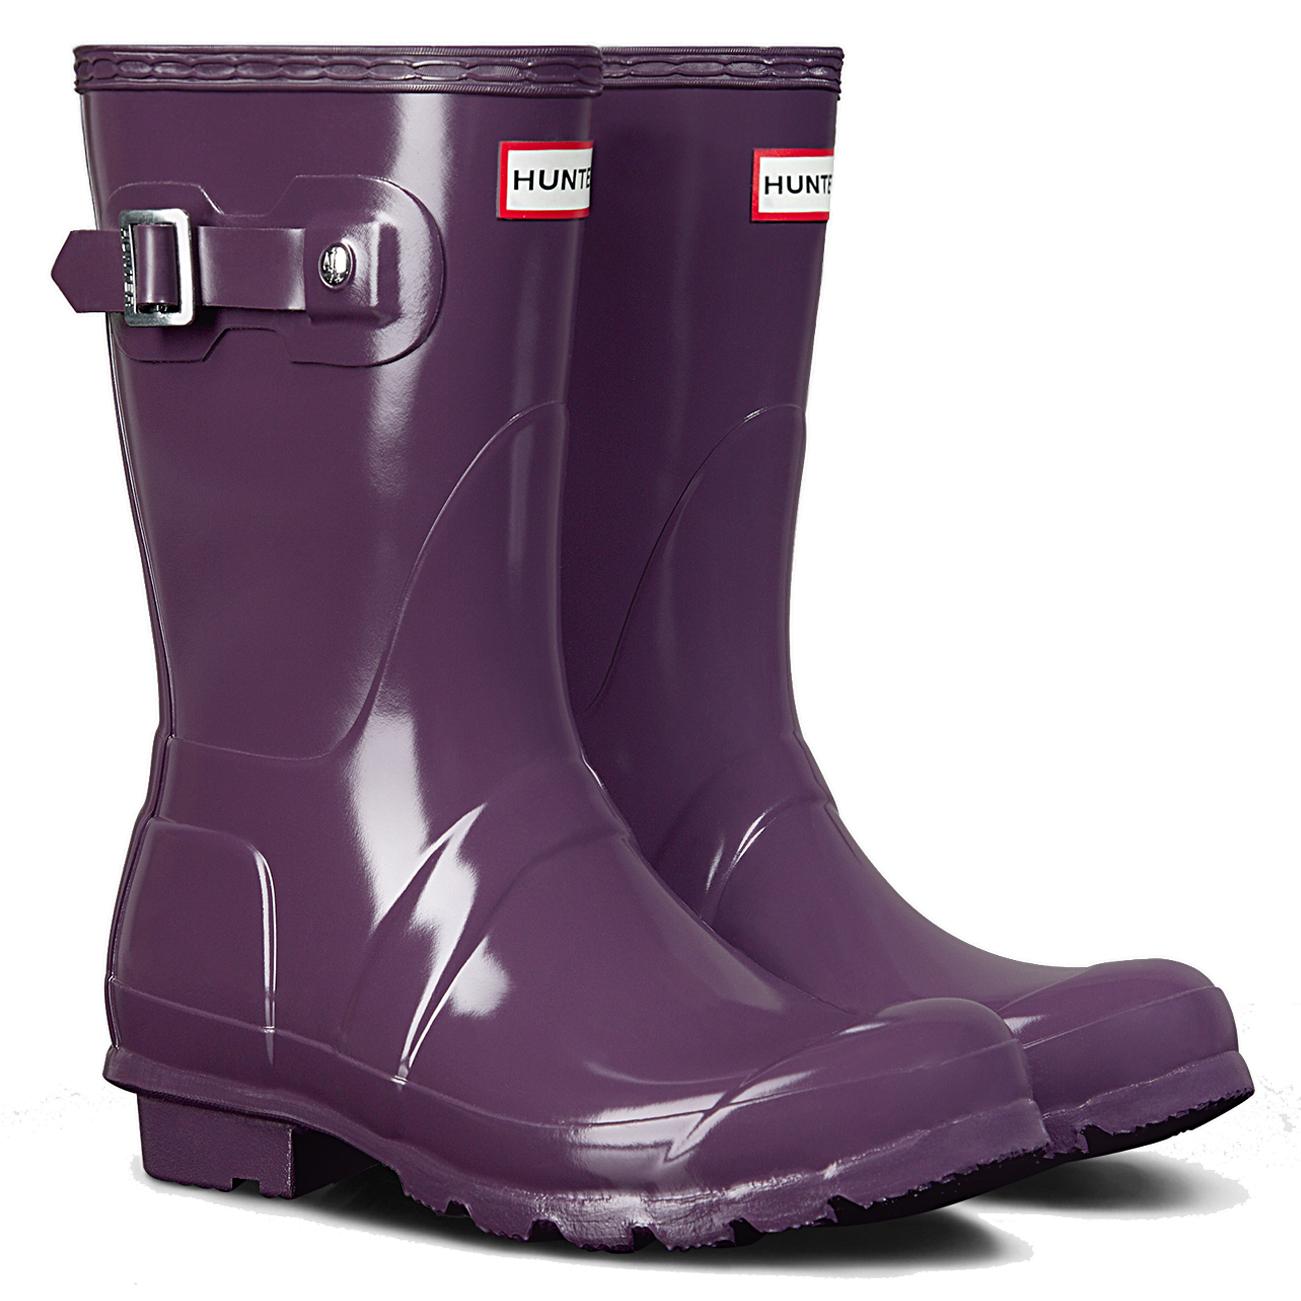 Ladies-Hunter-Original-Short-Gloss-Rain-Wellies-Winter-Mid-Calf-Boots-All-Sizes